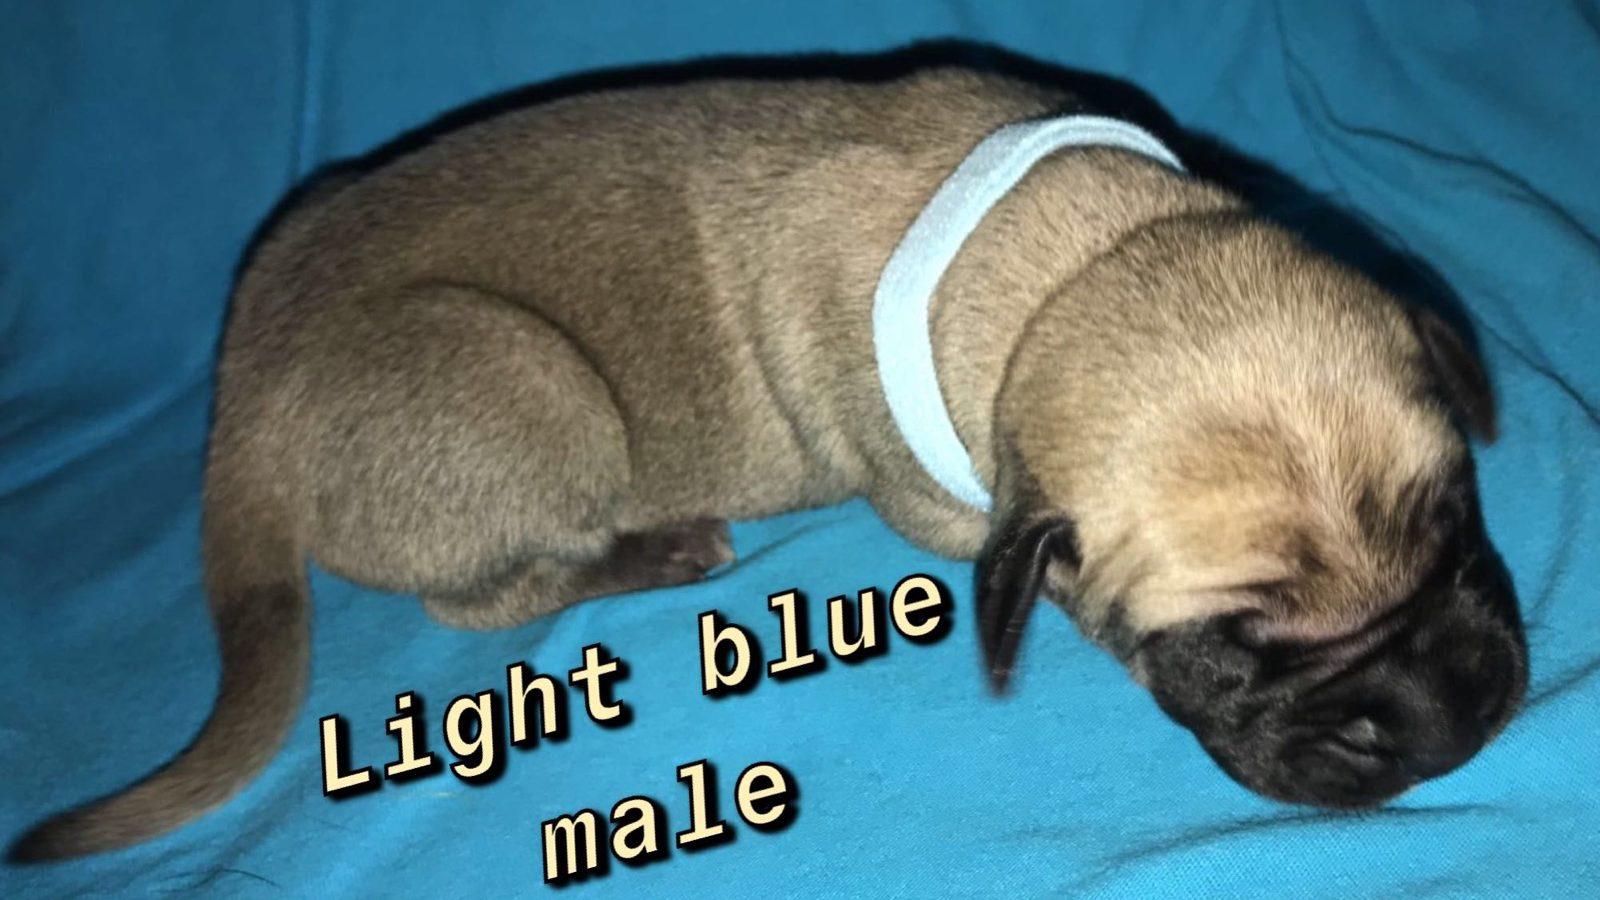 Image-Light blue FM